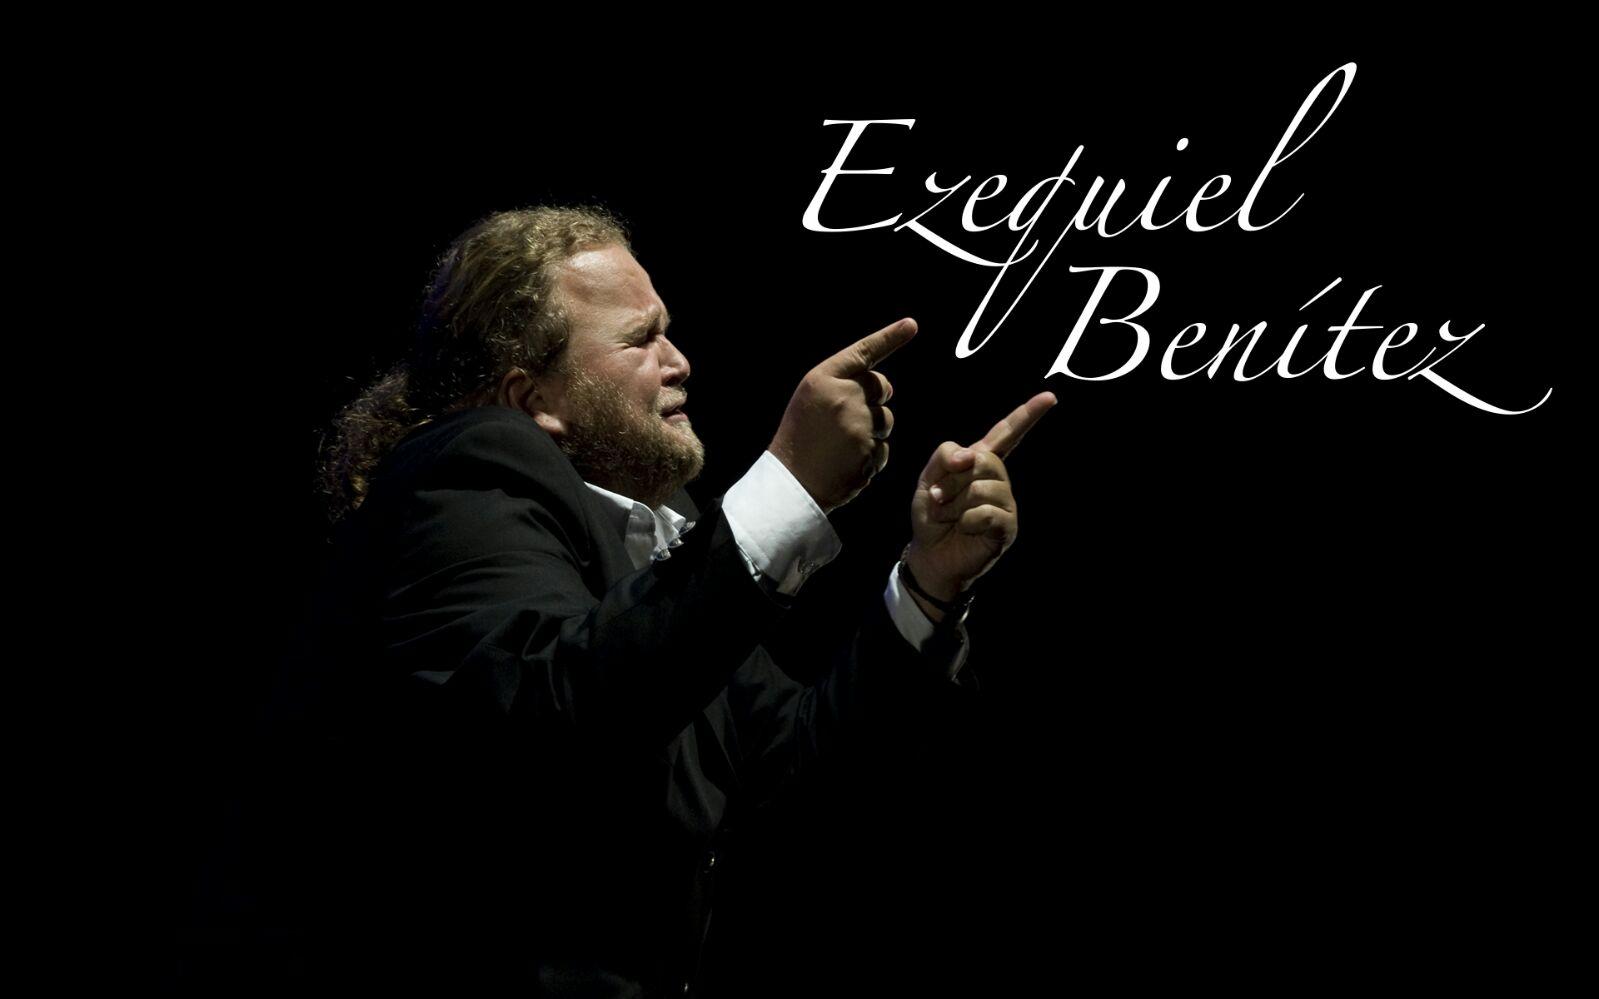 EZEQUIEL BENITEZ